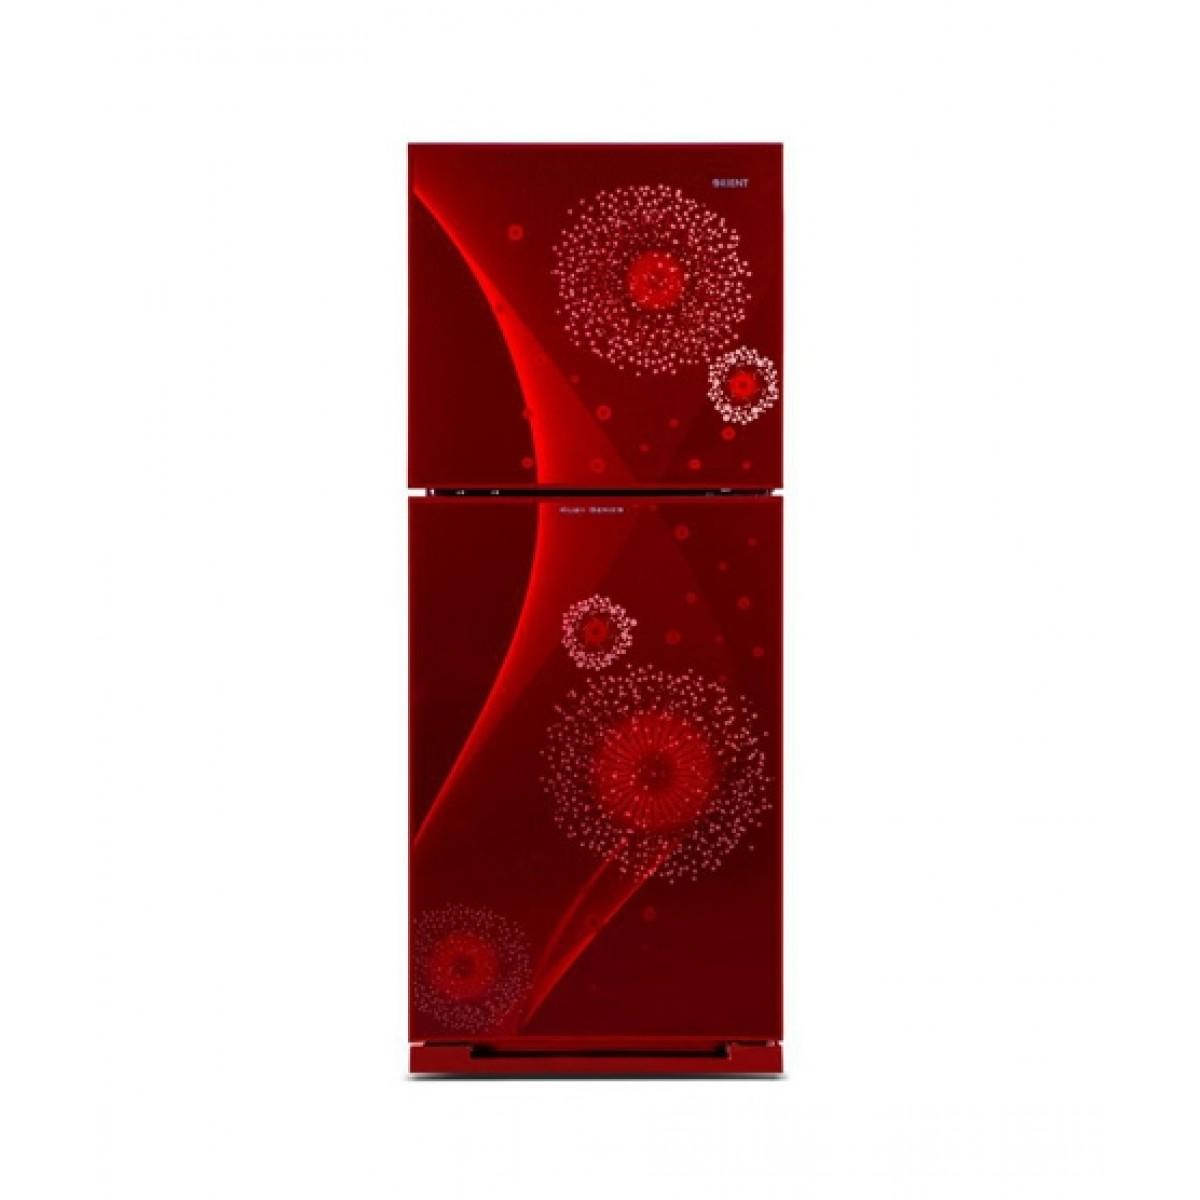 Orient Diamond 380 Freezer-on-Top Refrigerator 13 Cu Ft Planet Red (6057-2.1)